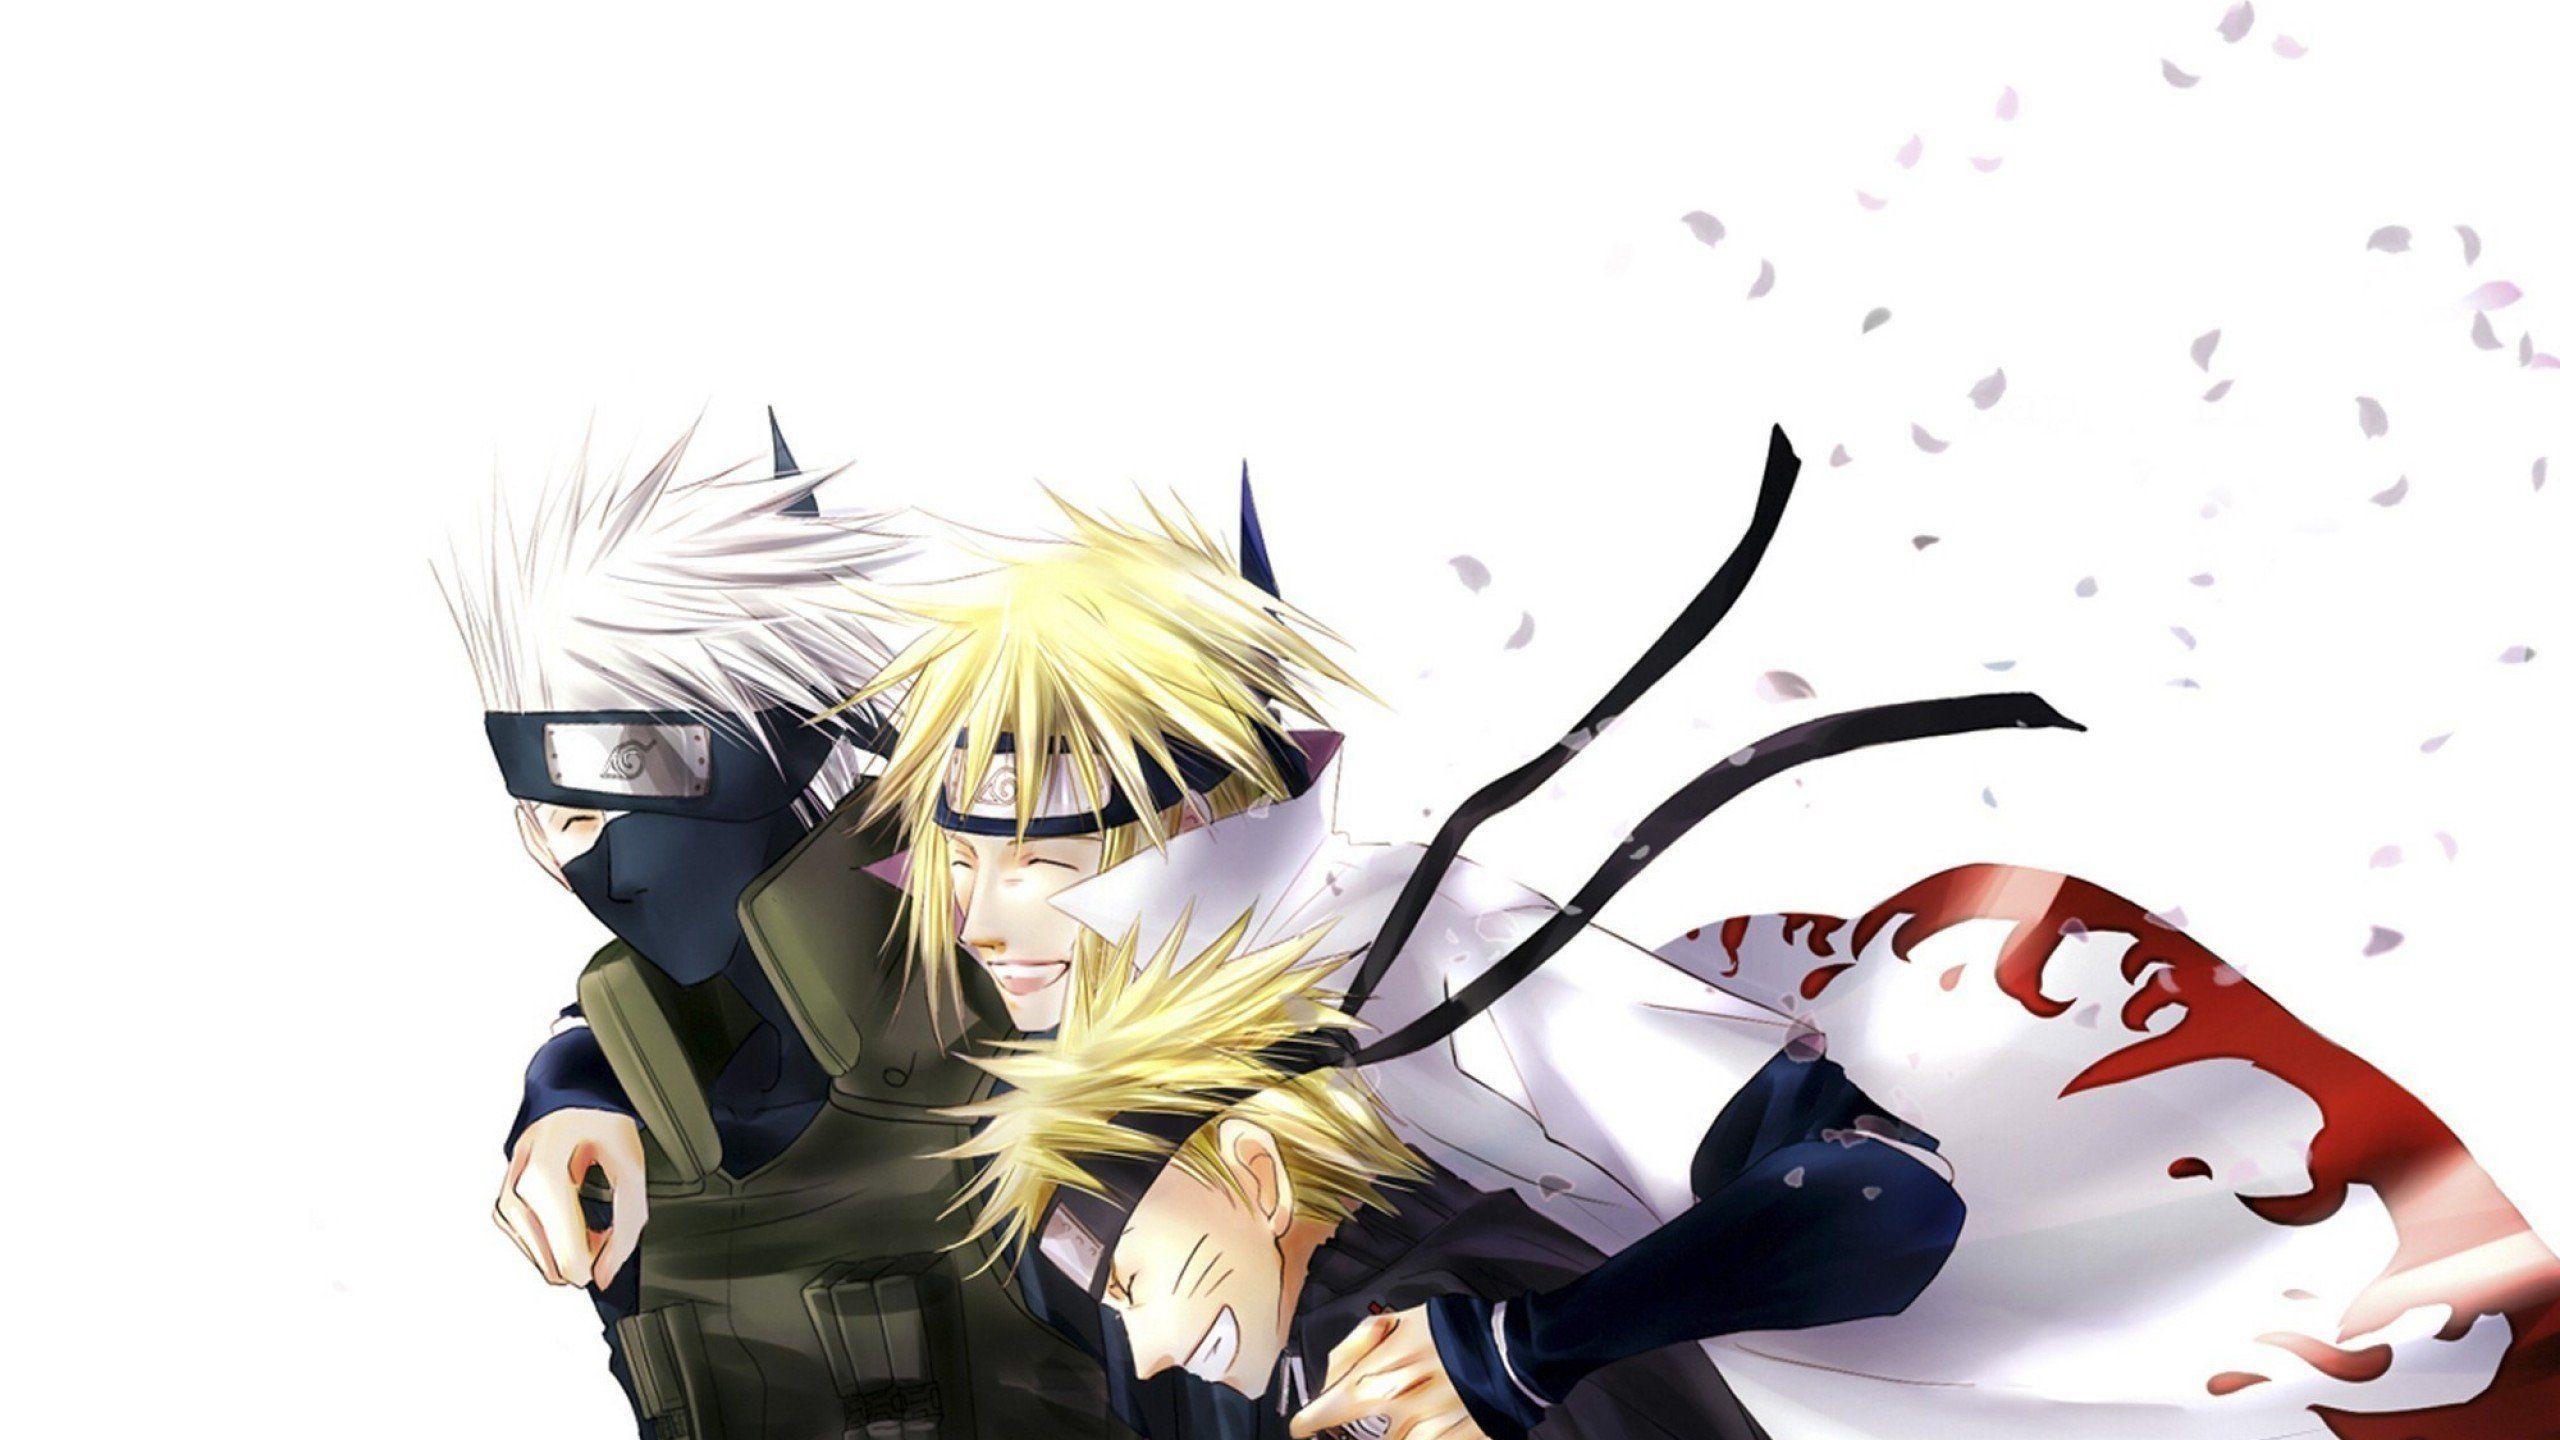 Naruto Hokage Wallpapers Top Free Naruto Hokage Backgrounds Wallpaperaccess